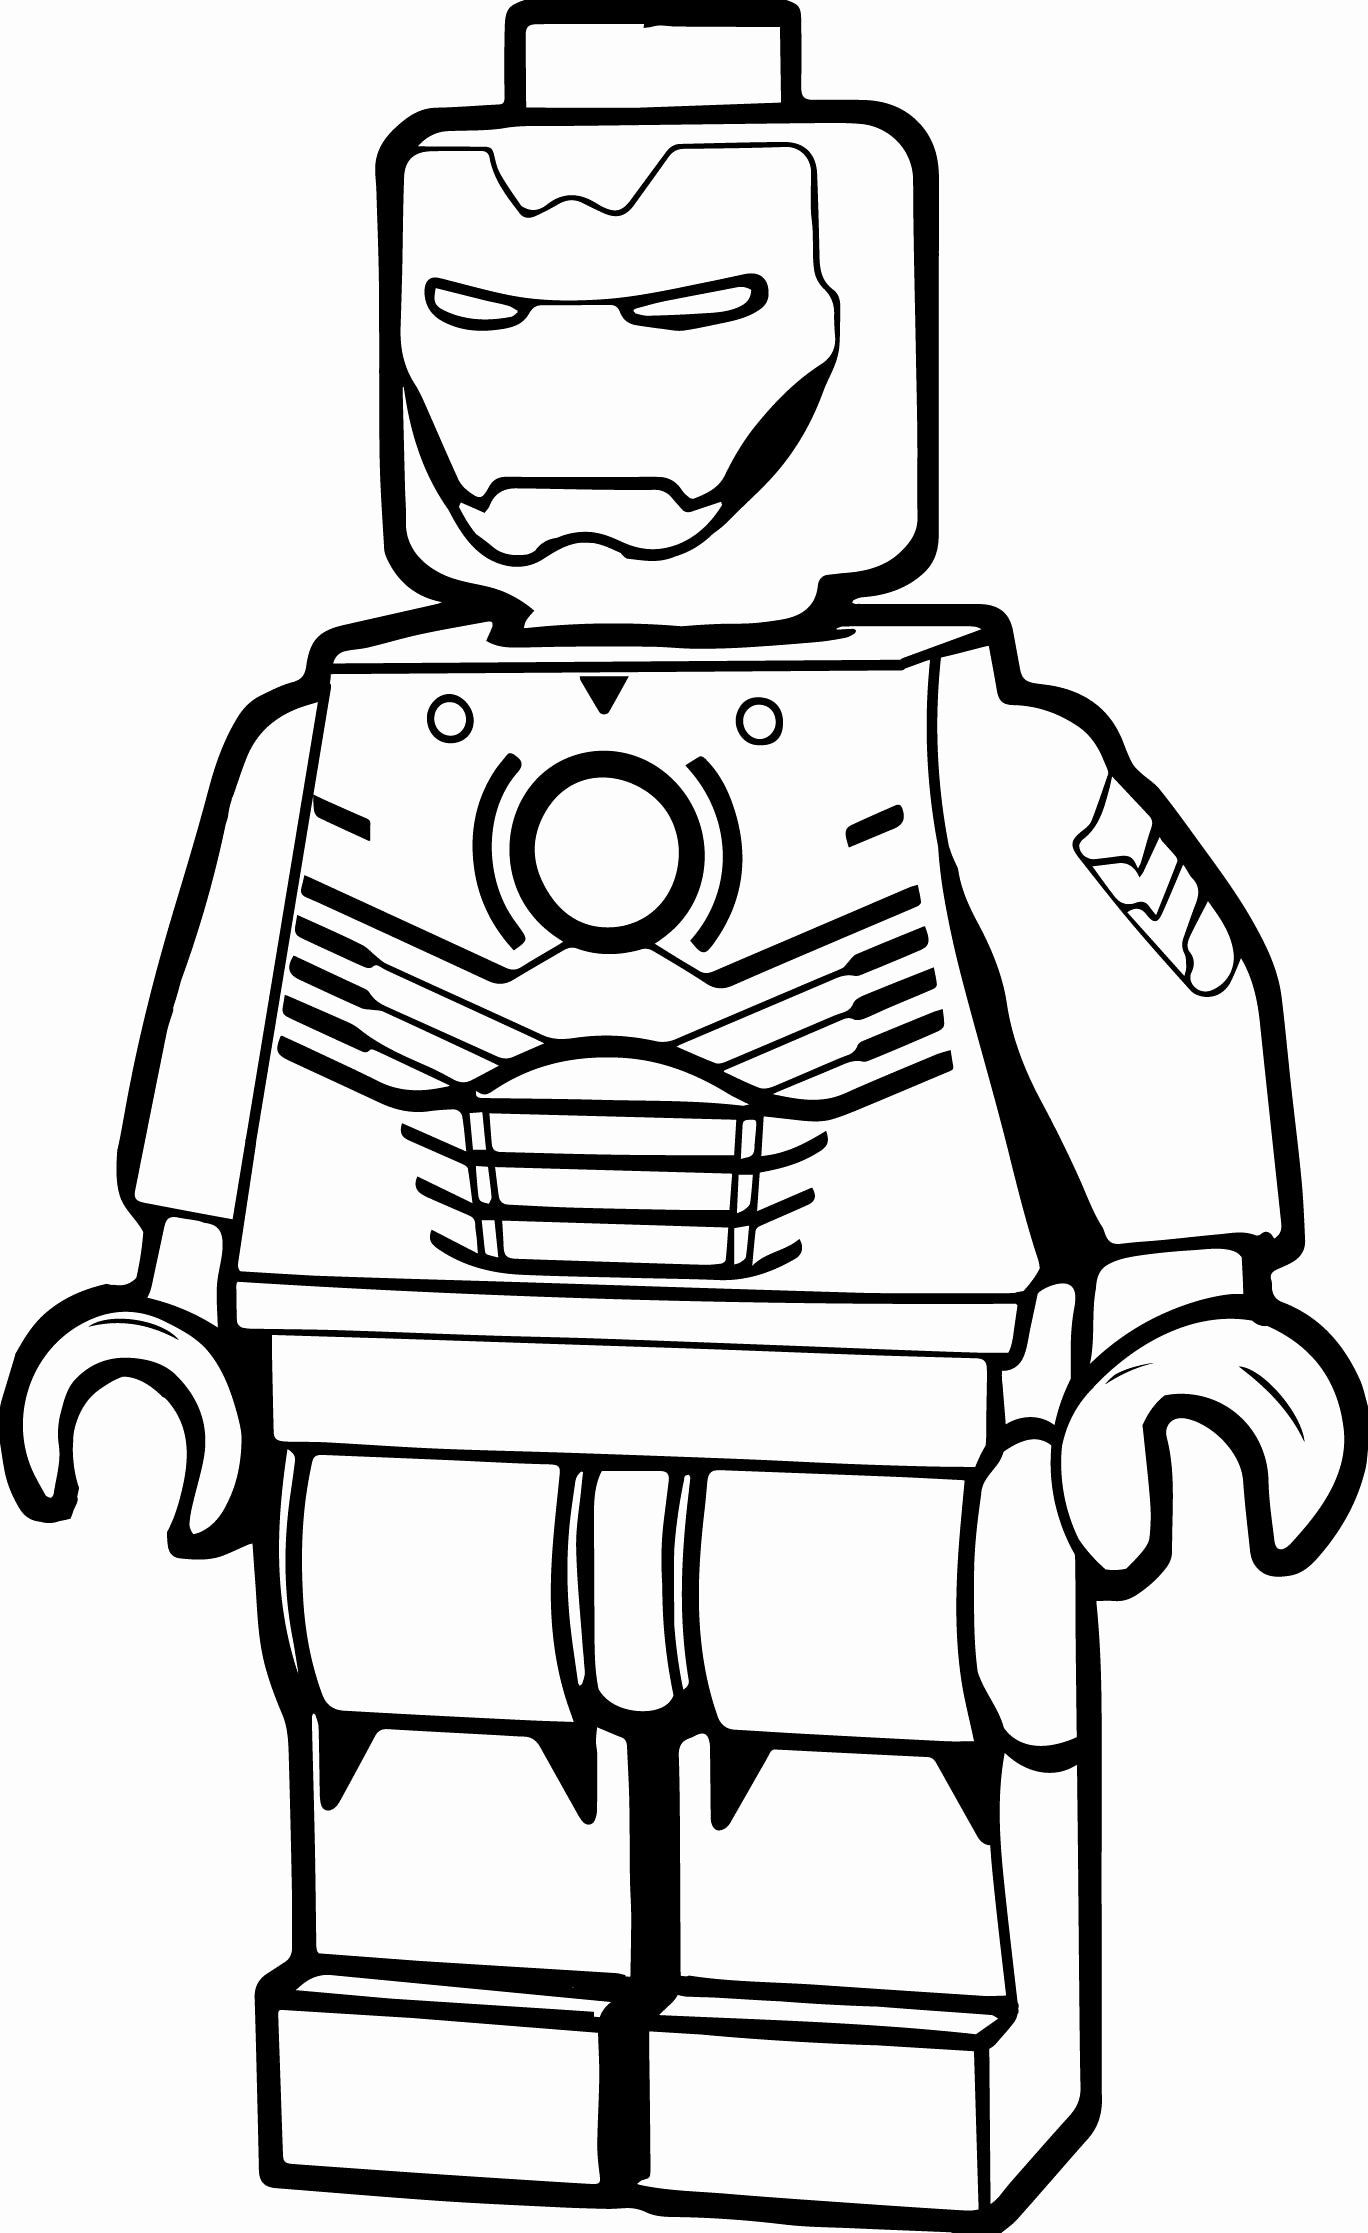 Lego Man Coloring Page Awesome Lego Iron Man Coloring Page In 2020 Lego Coloring Lego Coloring Pages Lego Iron Man